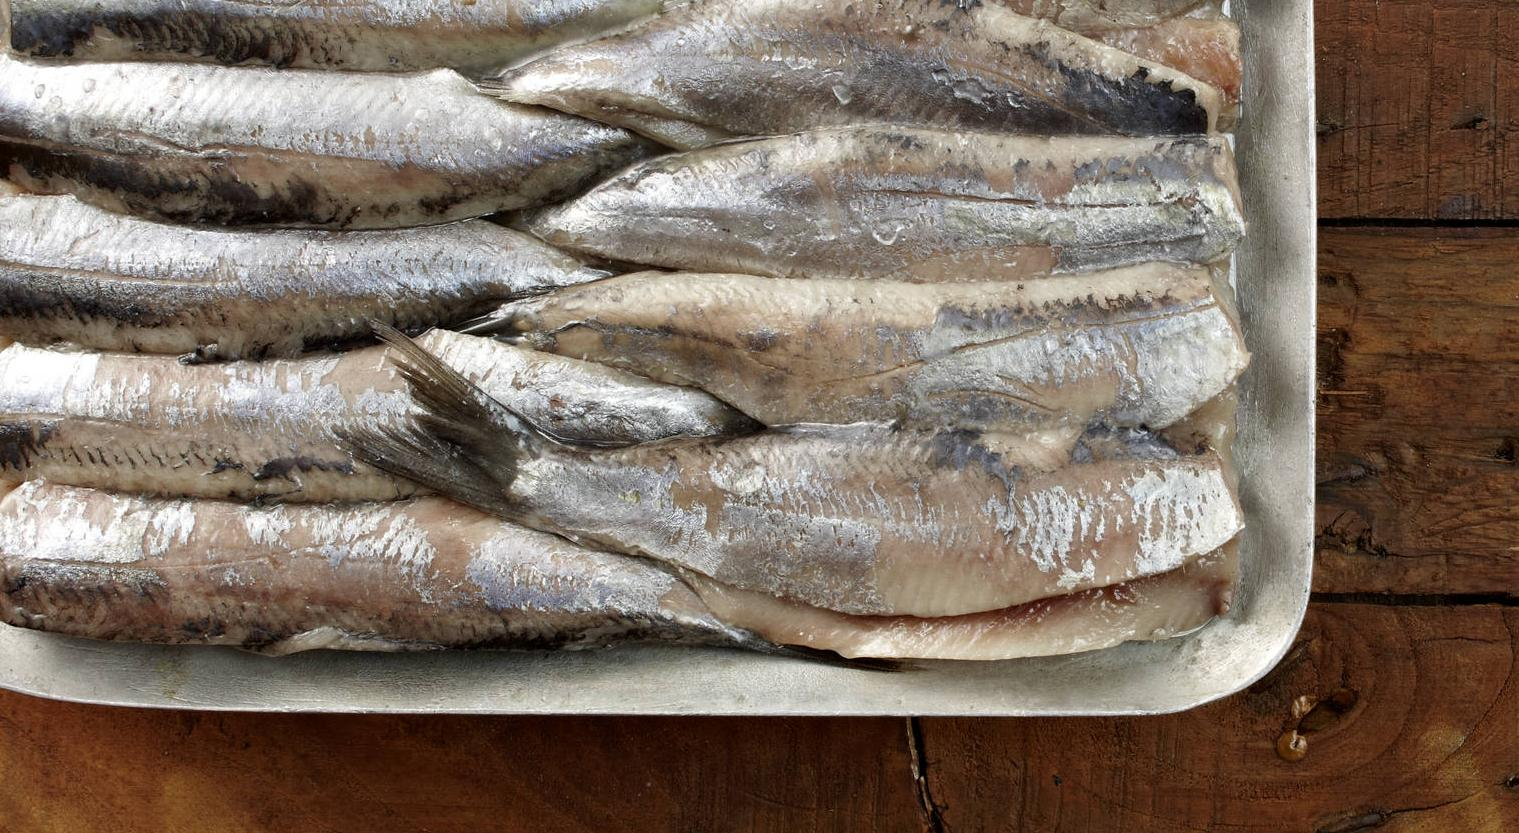 Viel mehr Fisch im Meer Datingwebsite